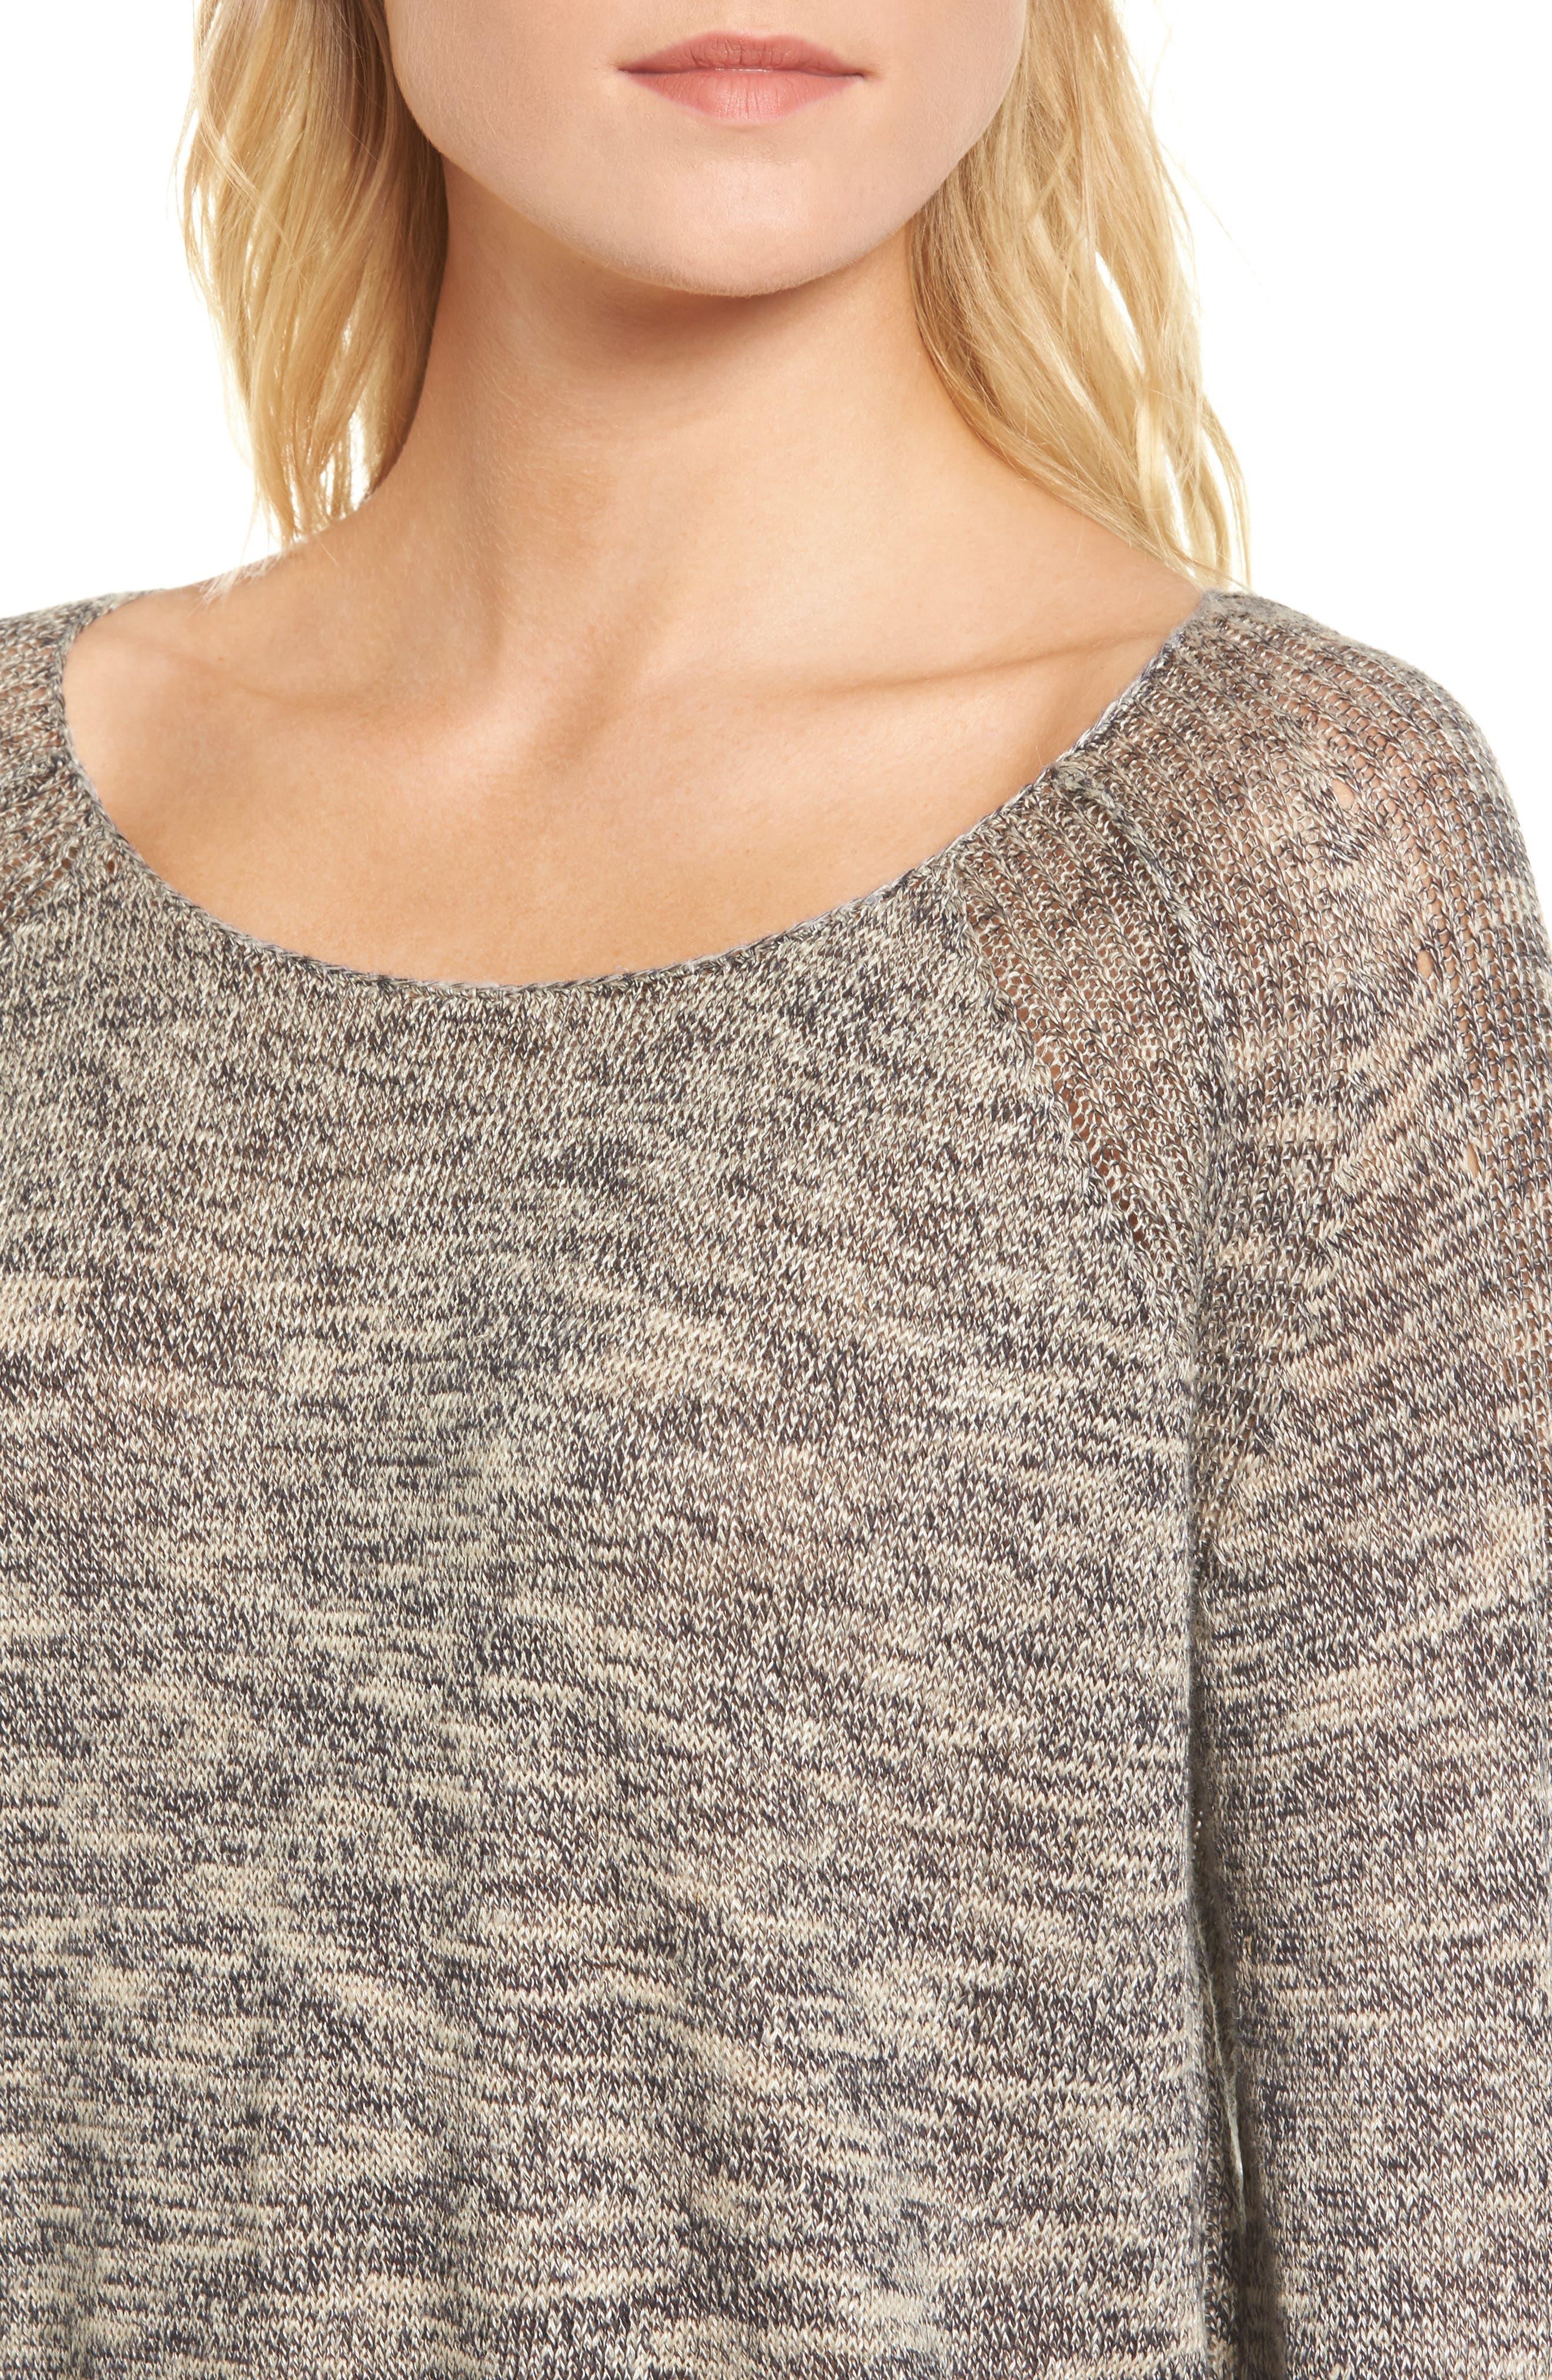 Flora Sweater,                             Alternate thumbnail 4, color,                             Speckled Navy/ Beige